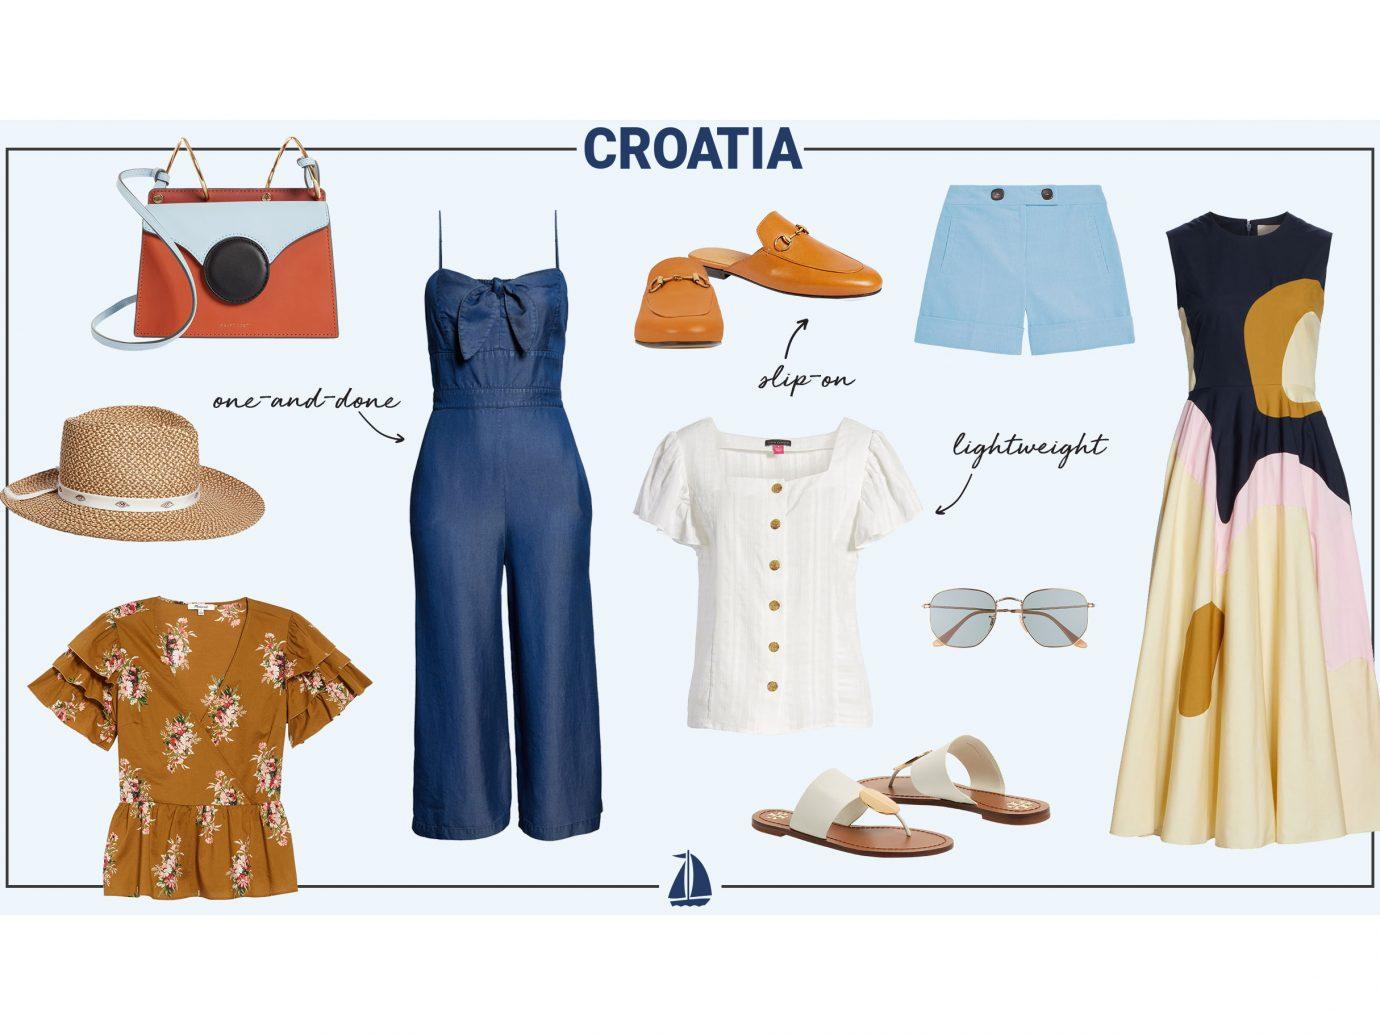 What to wear in Croatia collage - women